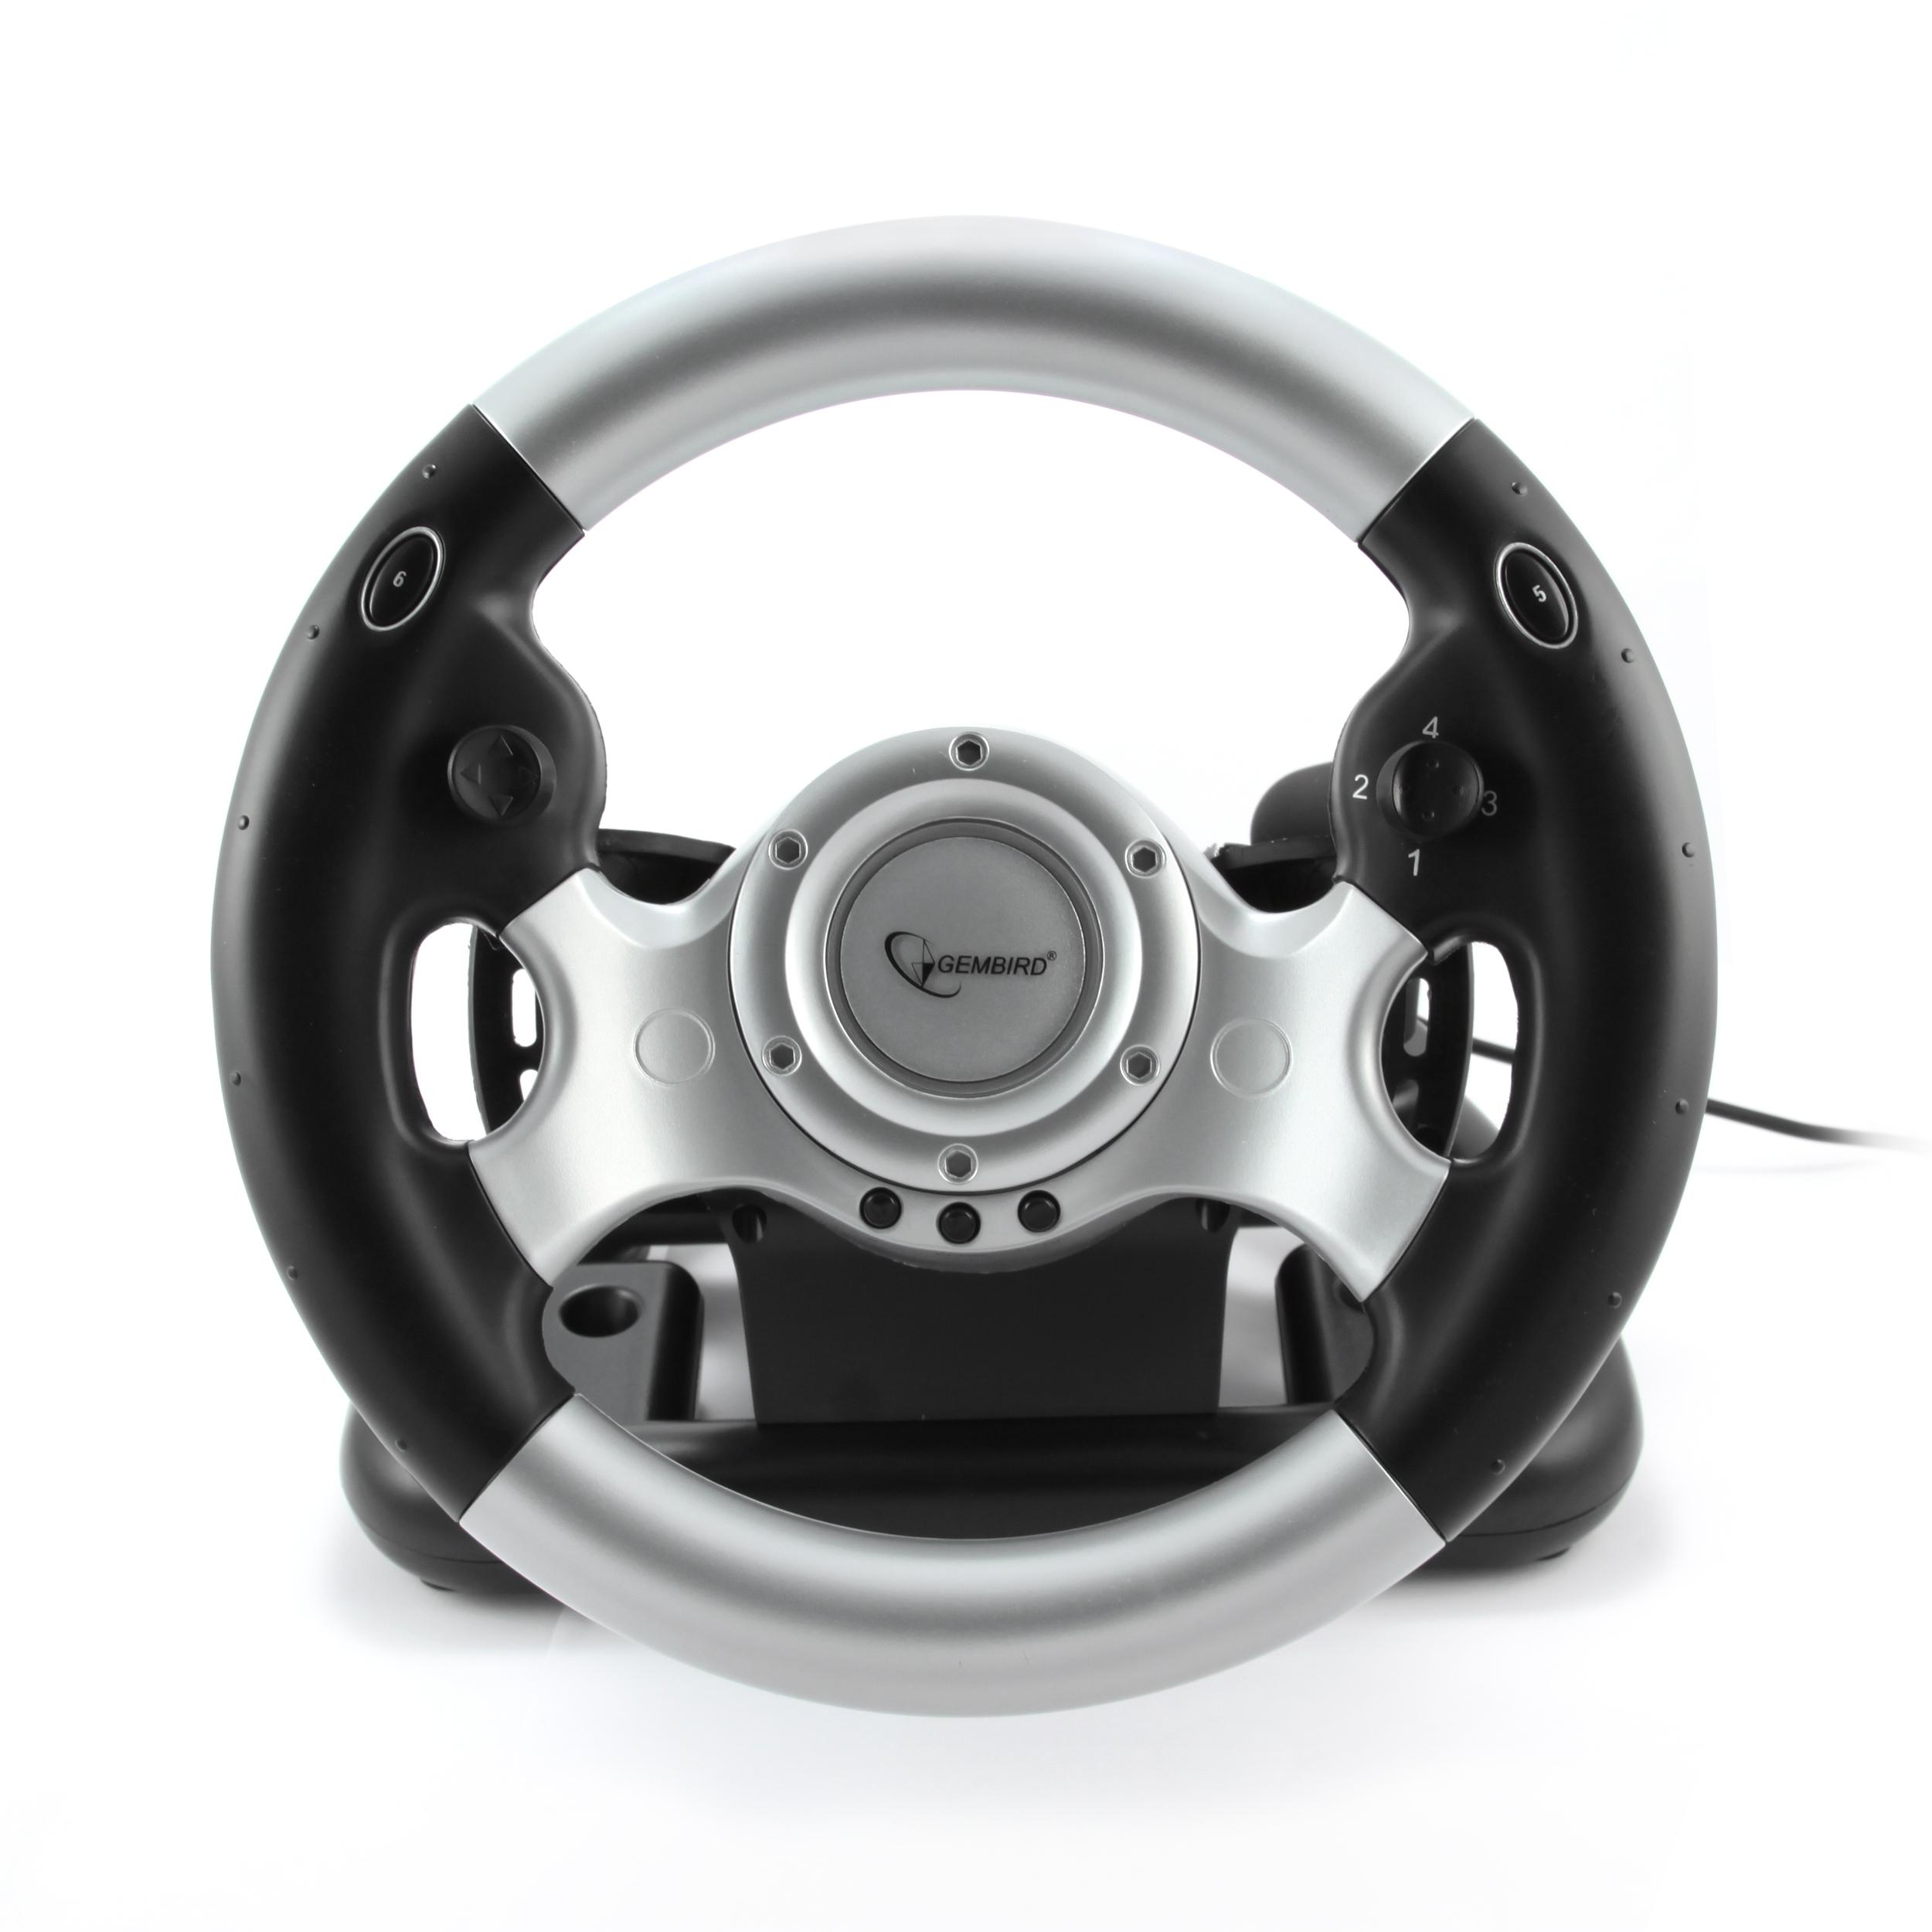 Руль defender mx v9 vibration драйвер new version